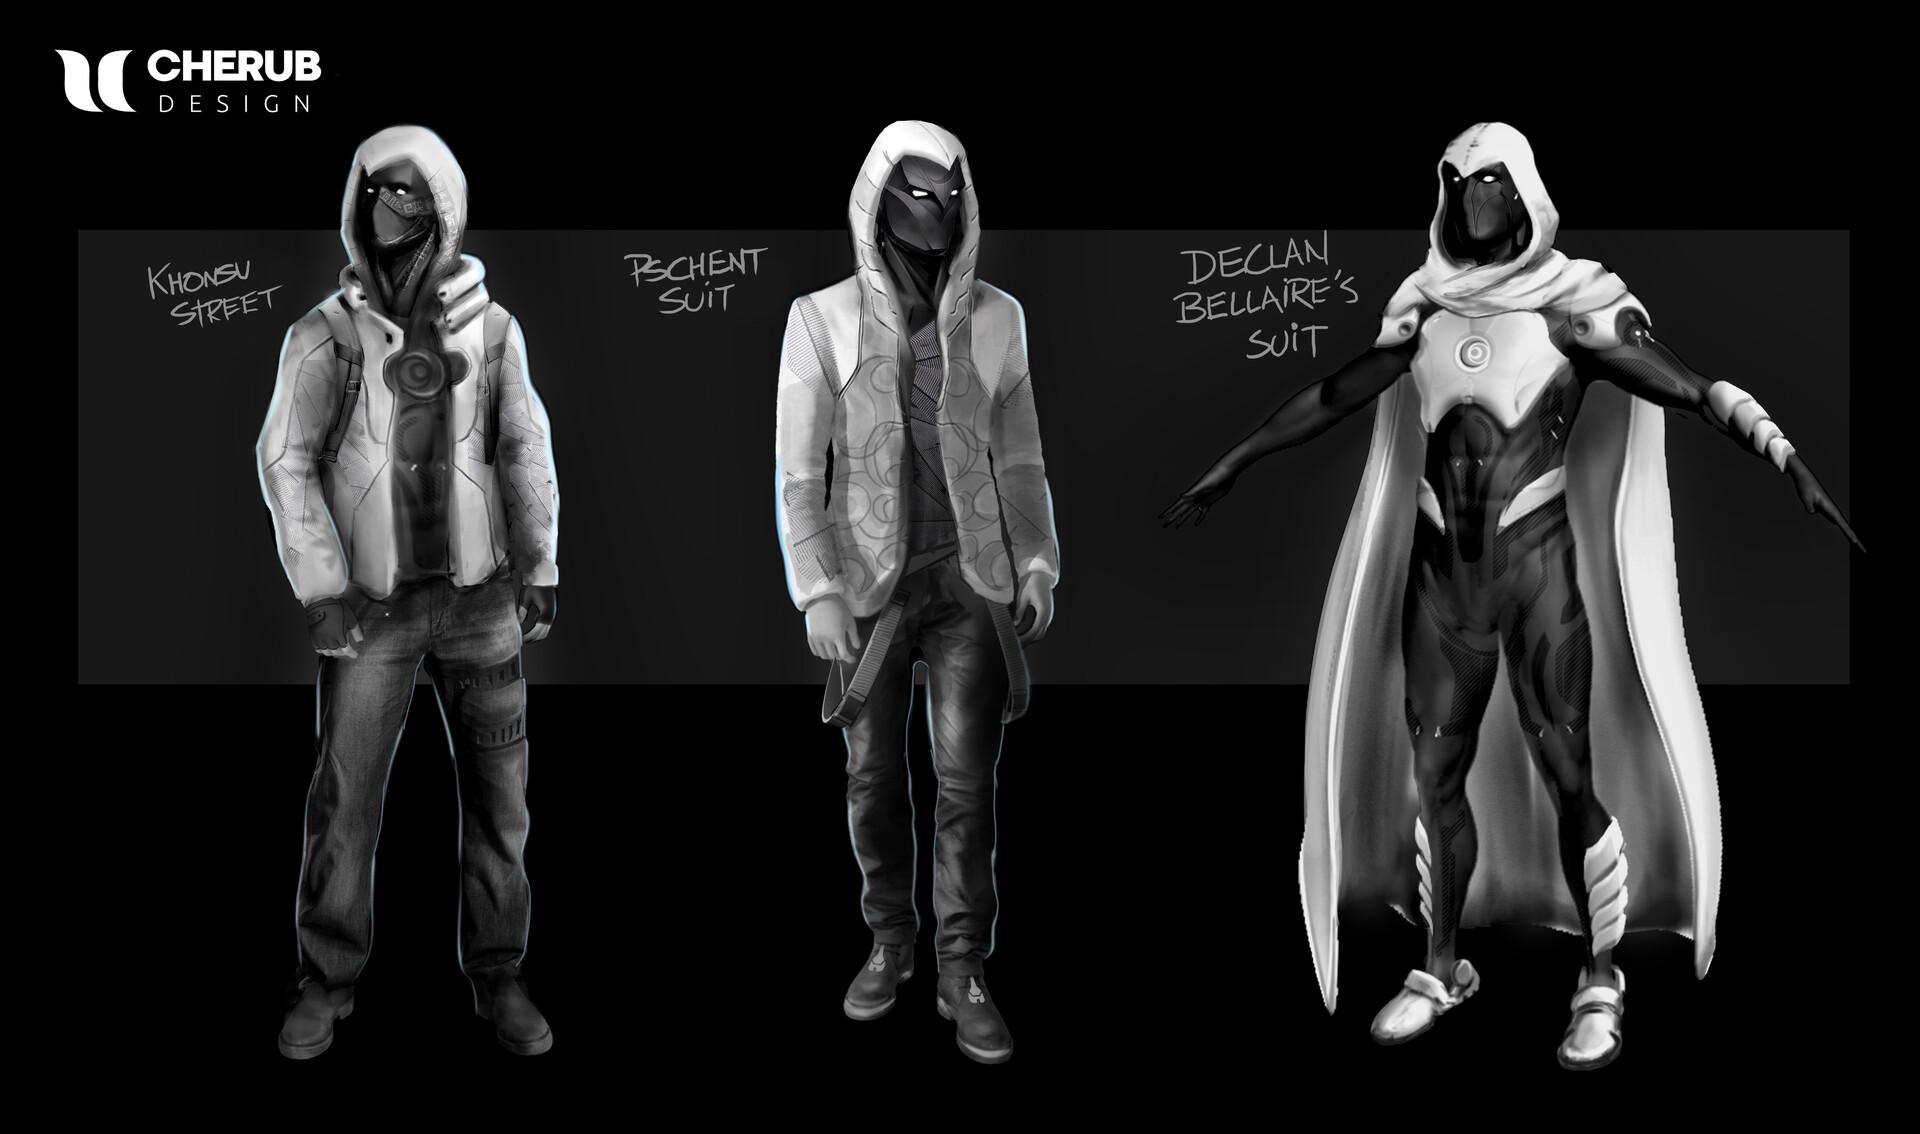 Luis cherubini moonknight concepts02